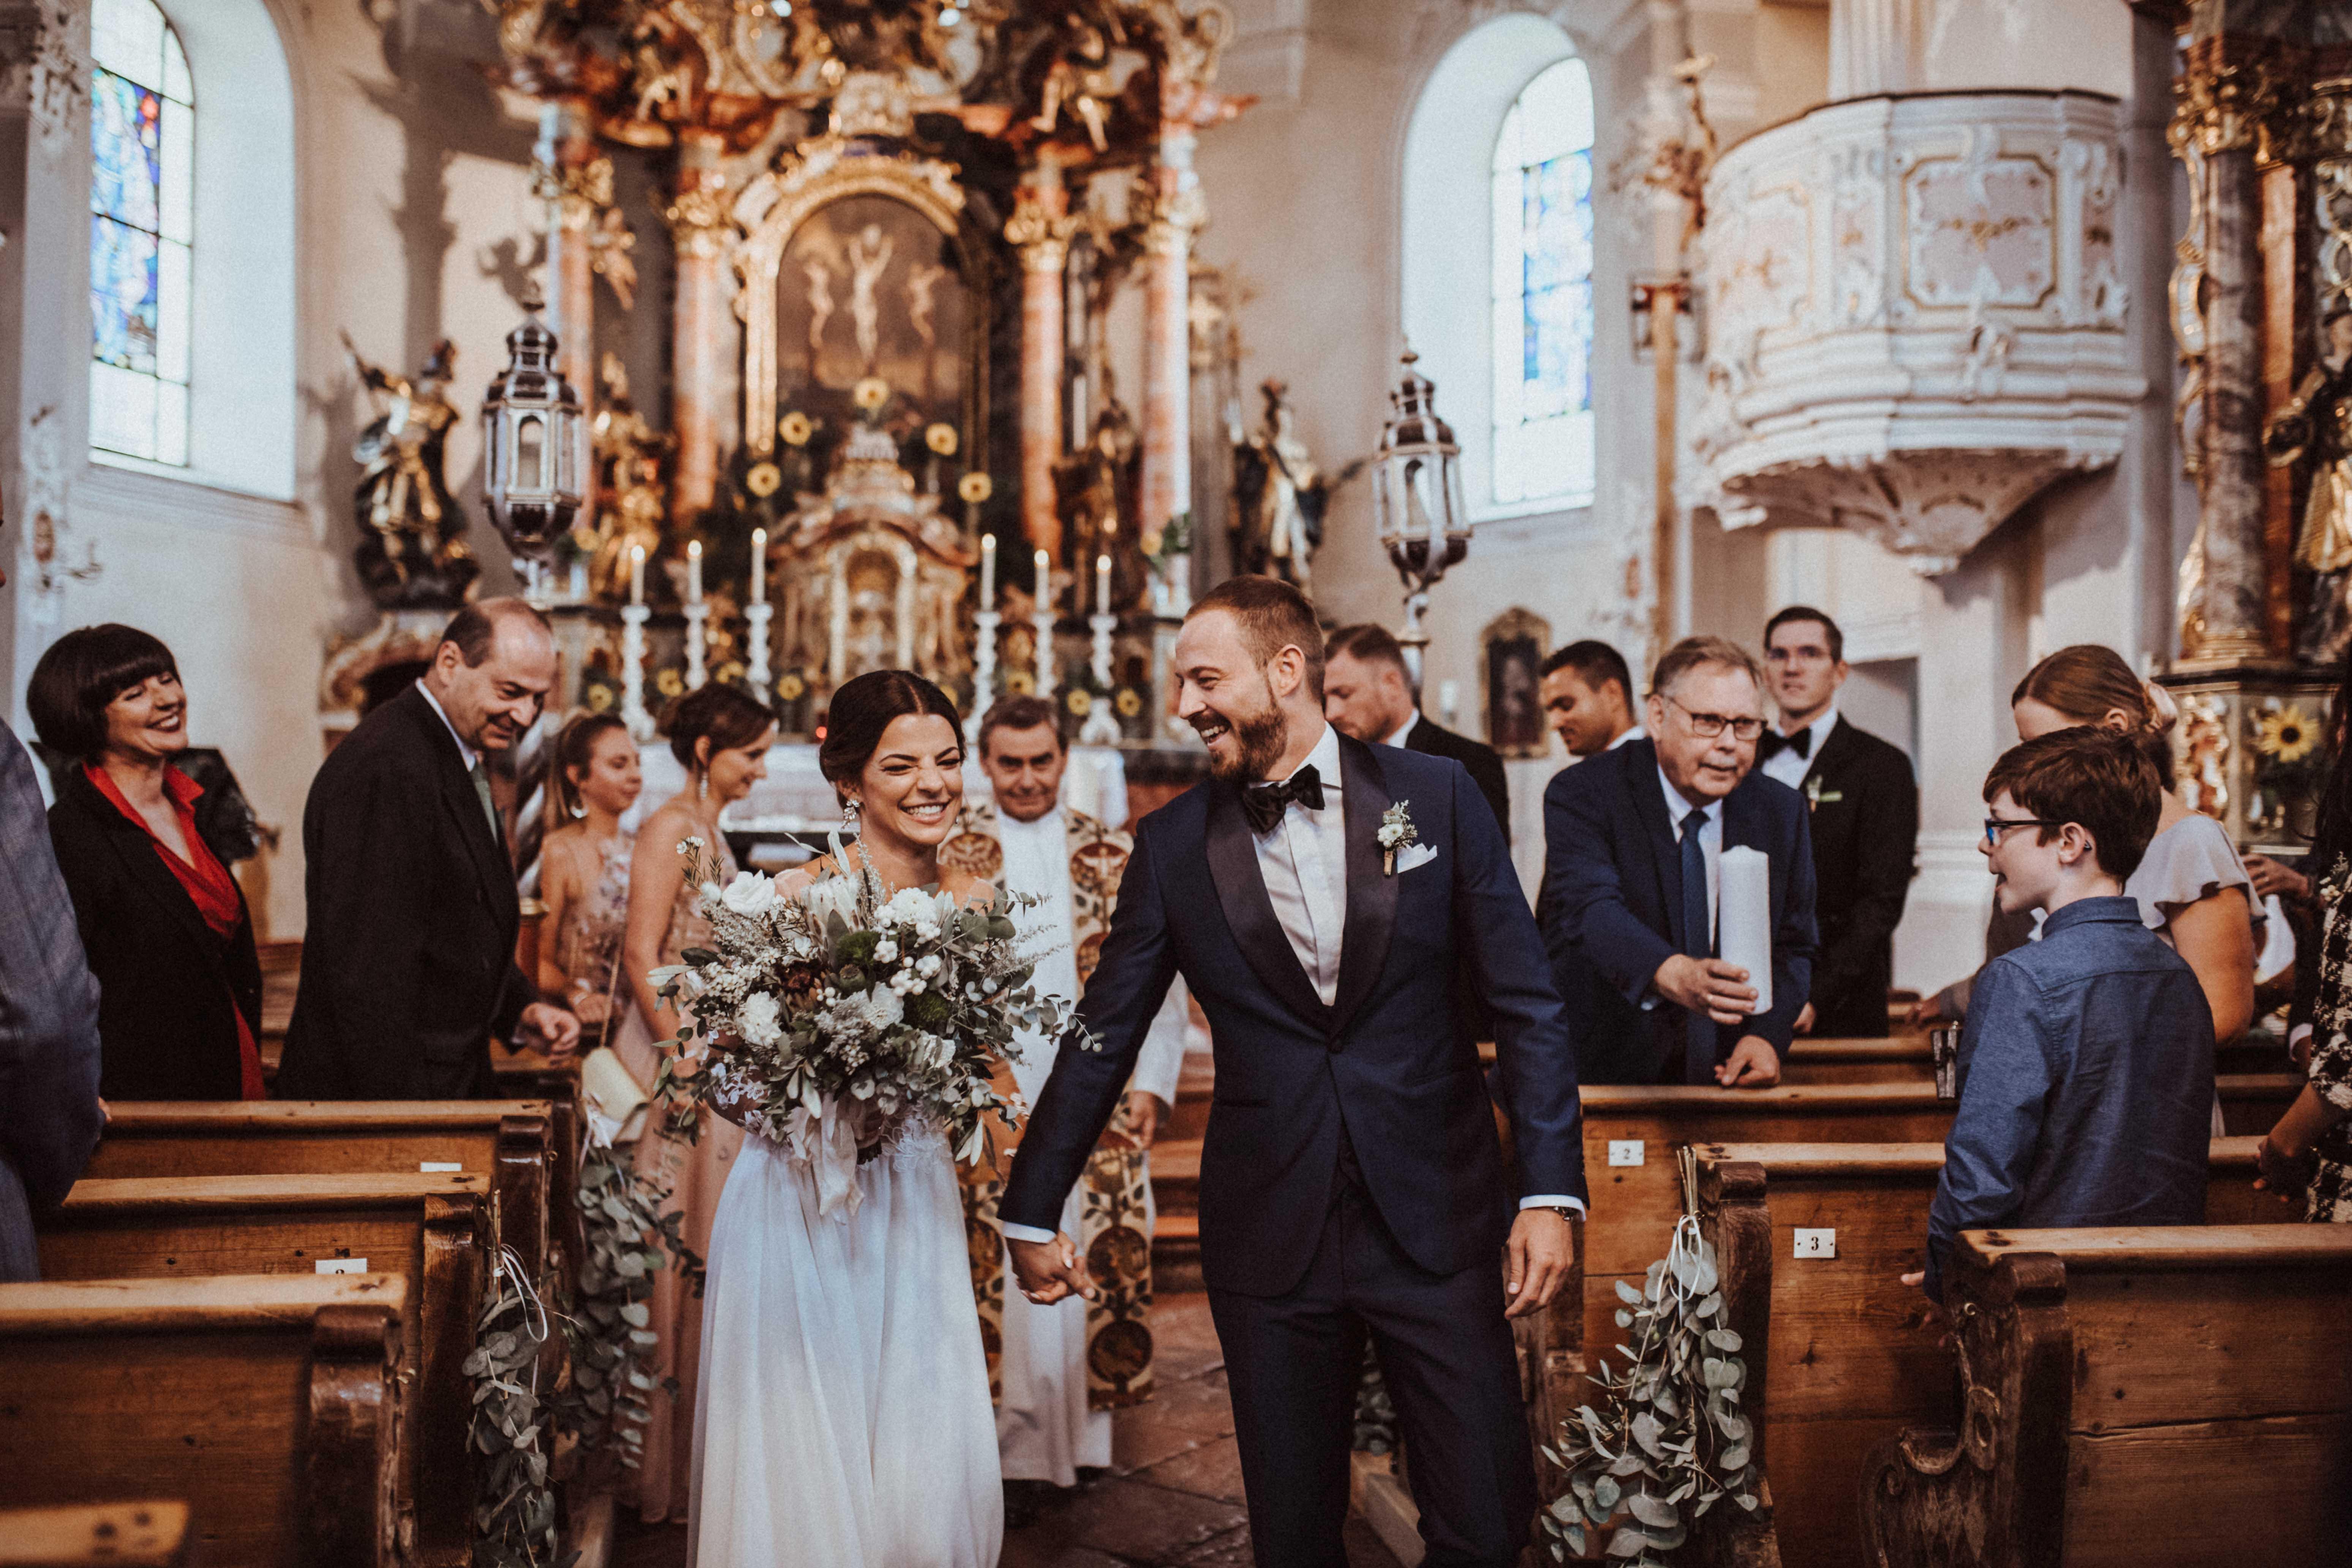 lachen auszug Sonja Pöhlmann Photography Wedding München Bayern